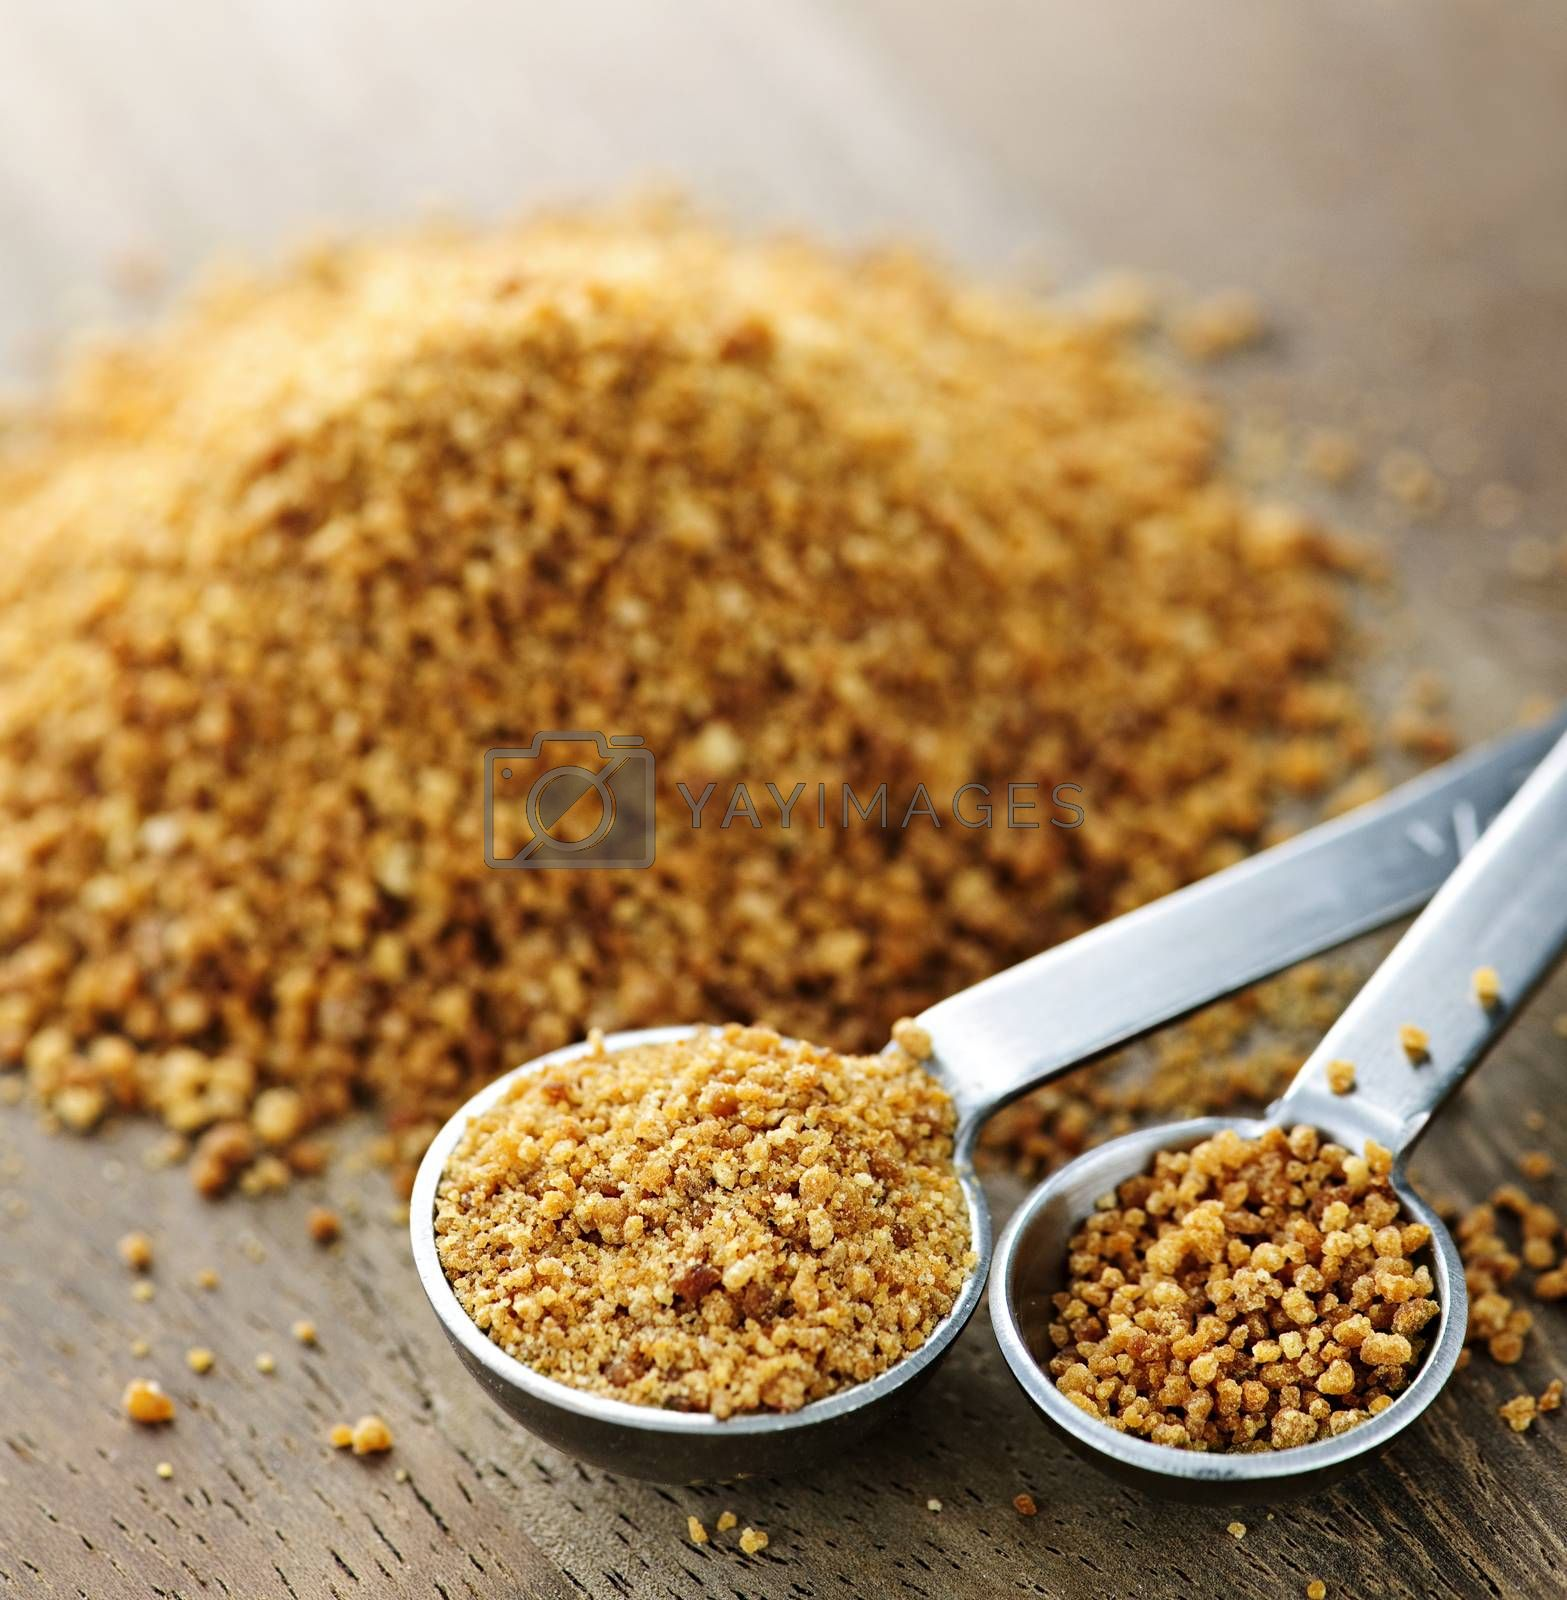 Organic coconut palm sugar in measuring spoons